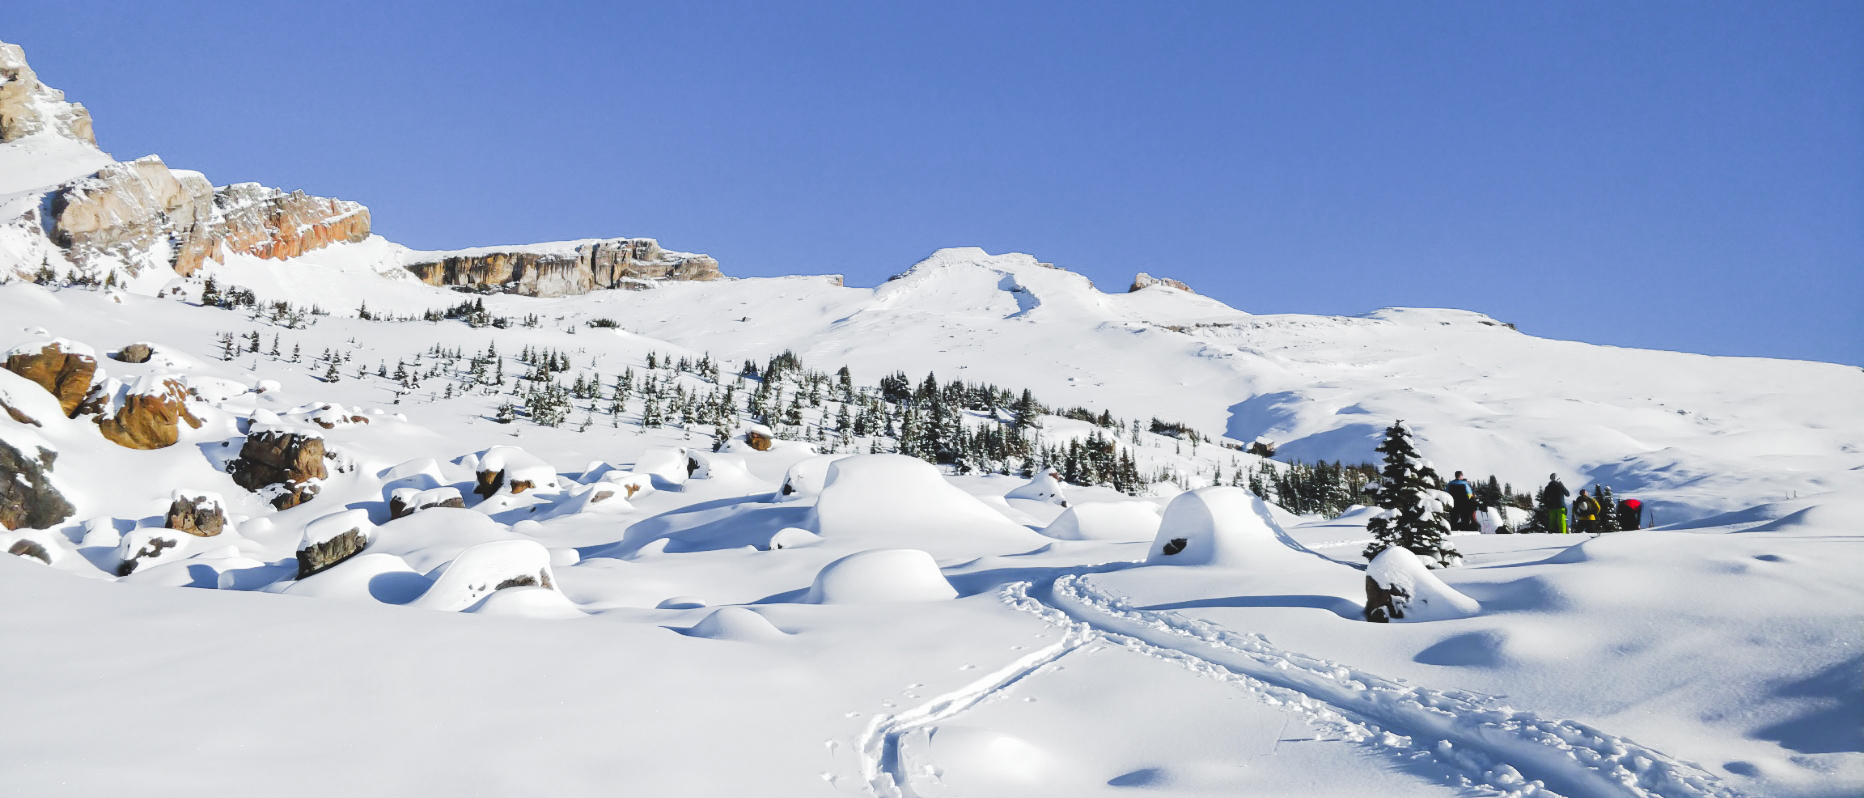 Oxo Puzzle Peak Ramp Watermelon Ridge in Winter